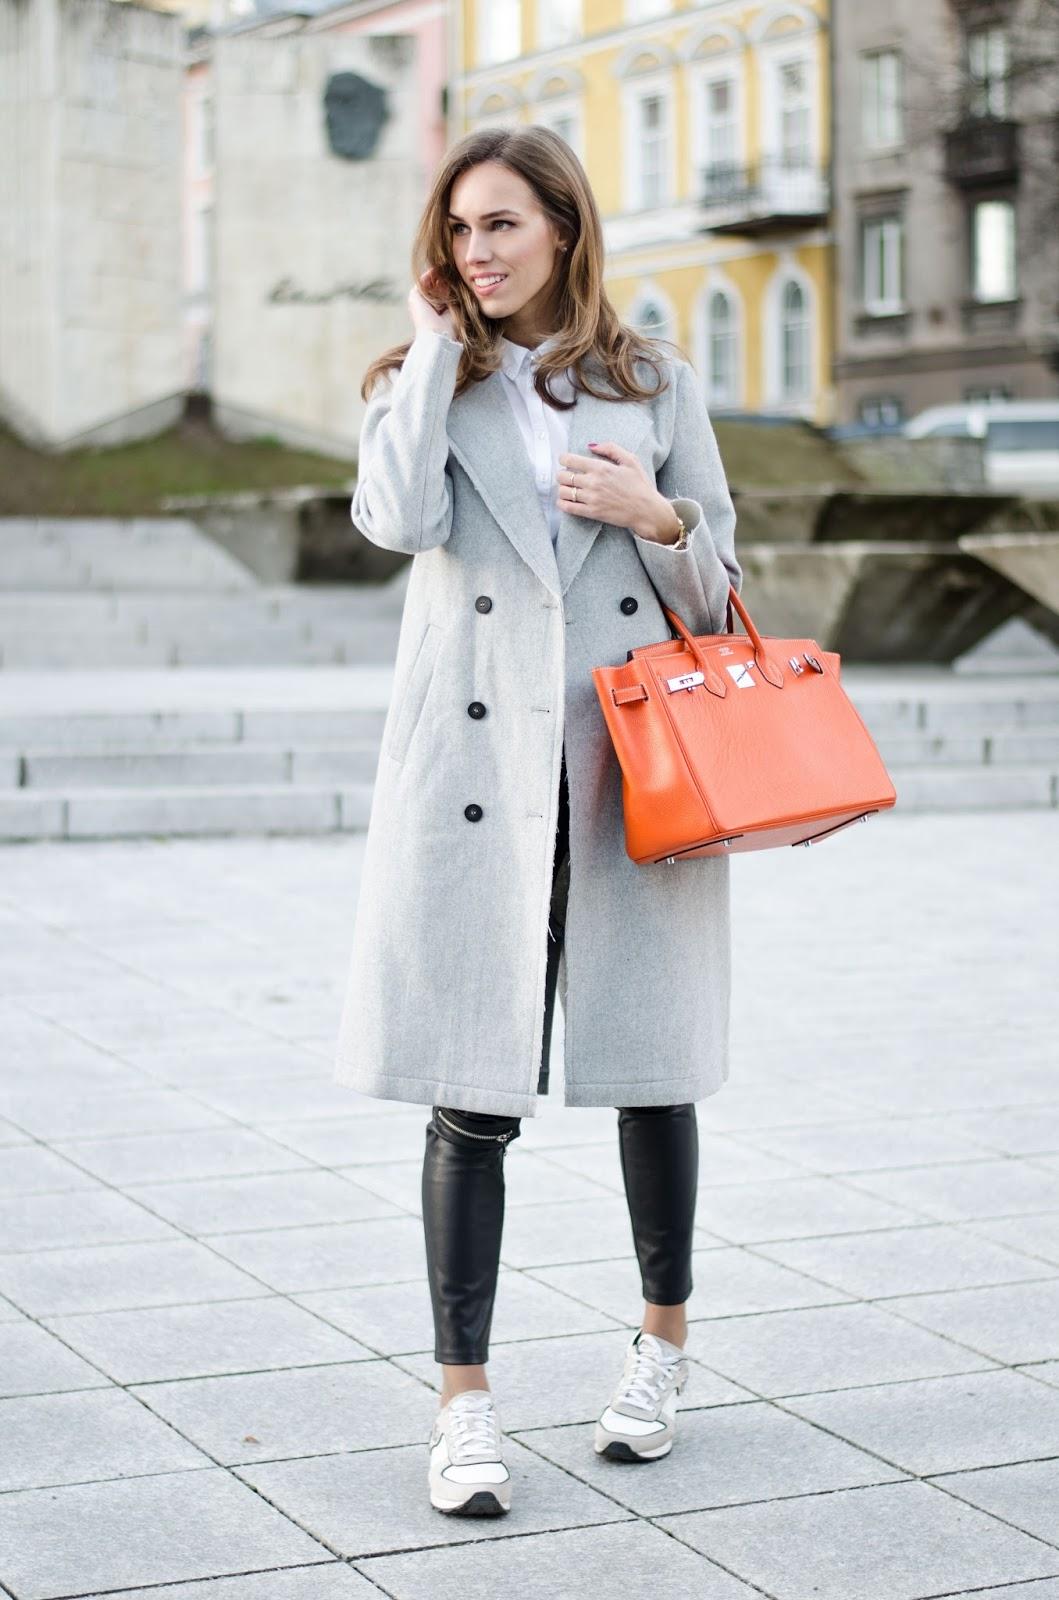 kristjaana mere vila gray coat armani sneakers hermes birkin bag winter outfit